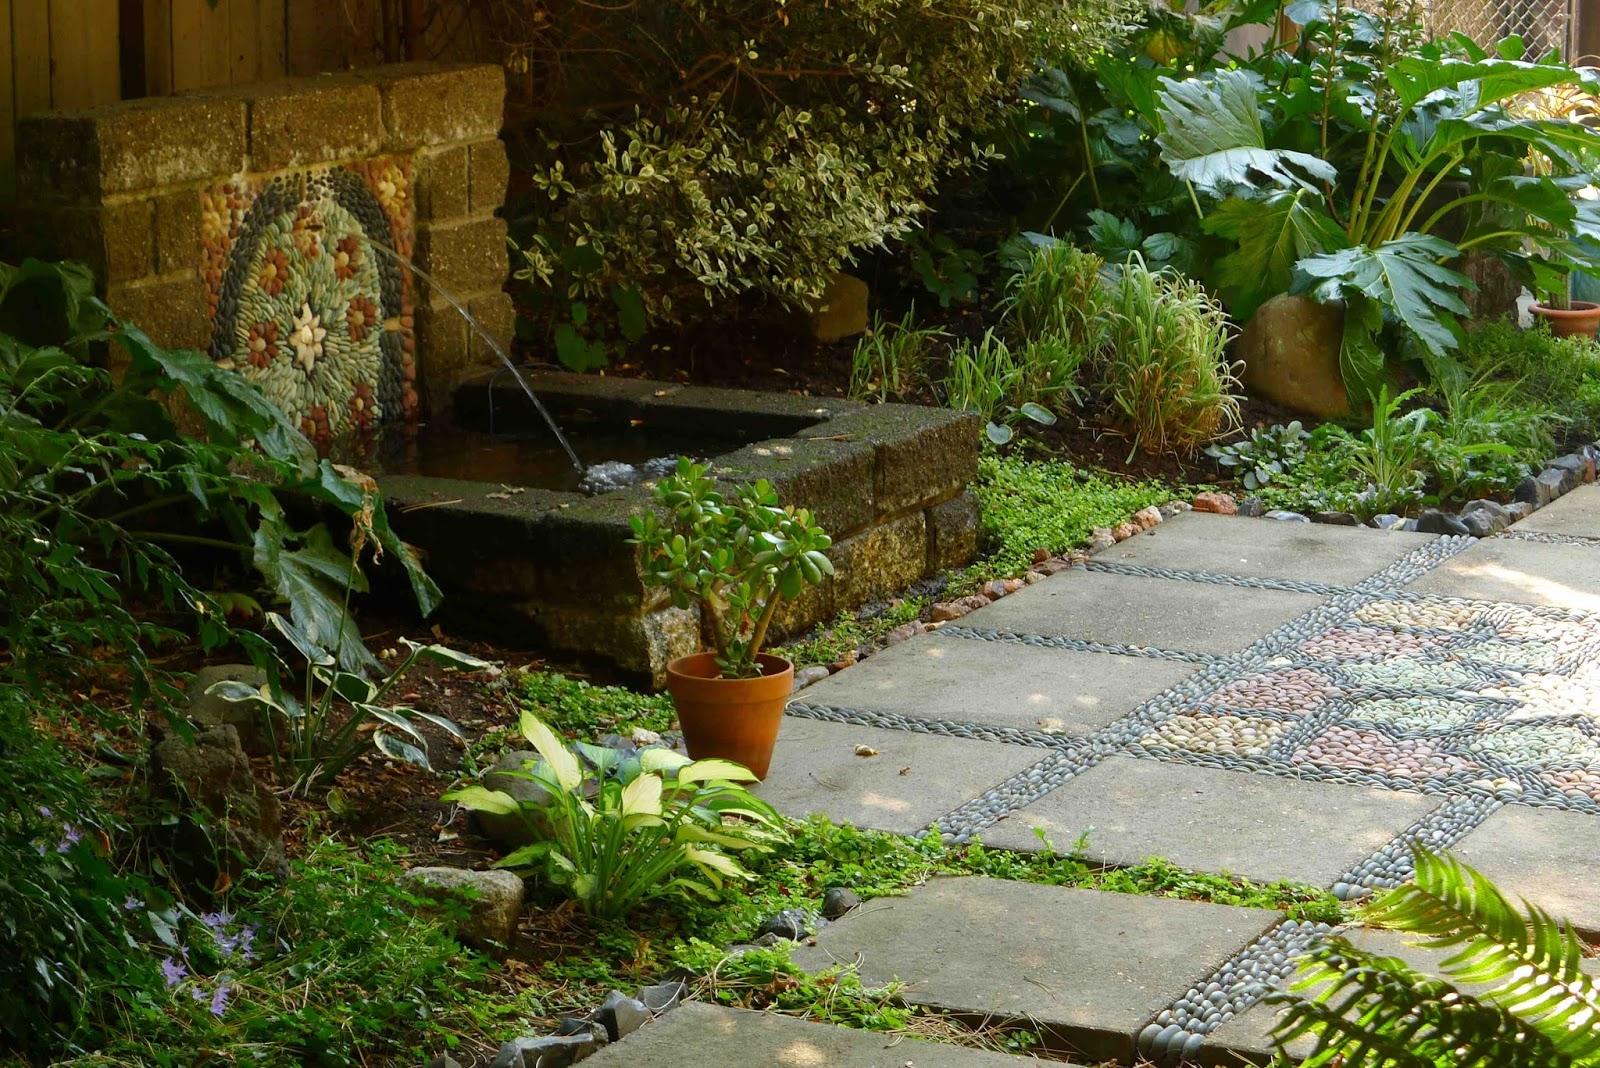 Jeffrey bale 39 s world of gardens september 2015 for Garden fountains portland oregon